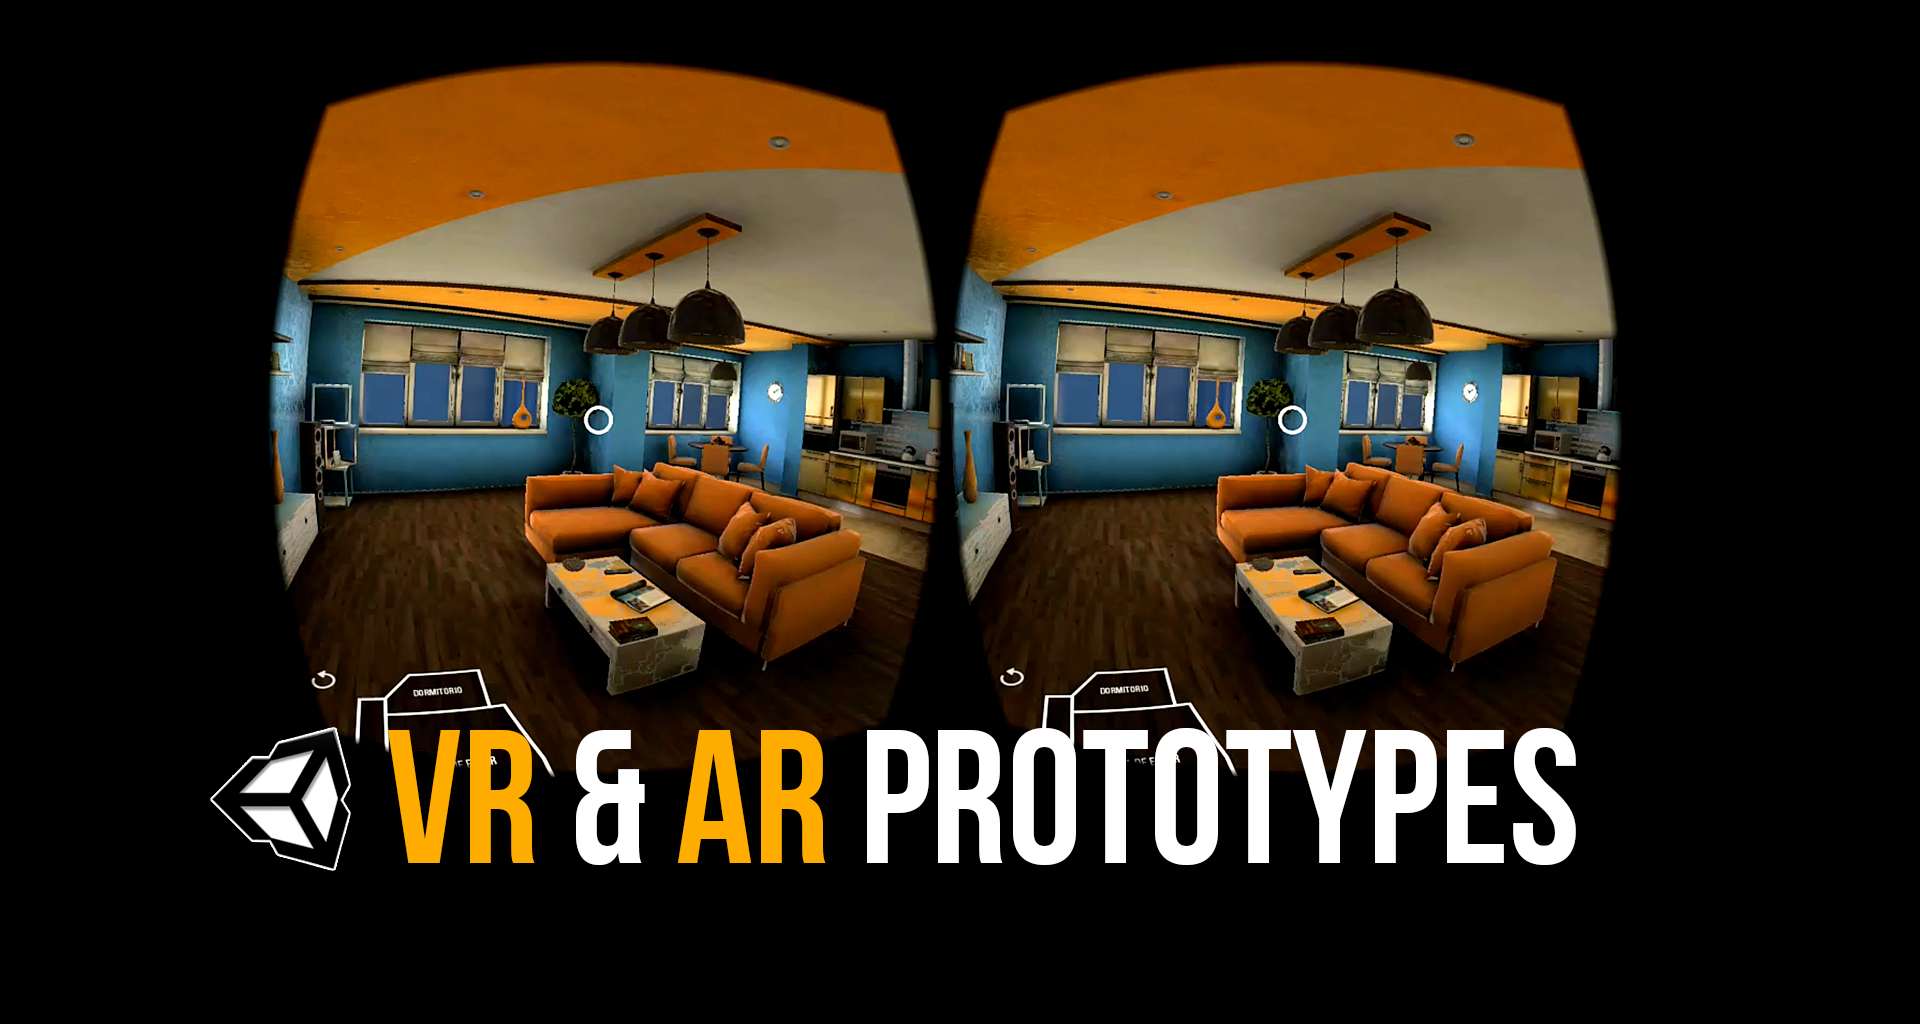 VR & AR prototypes - WIP